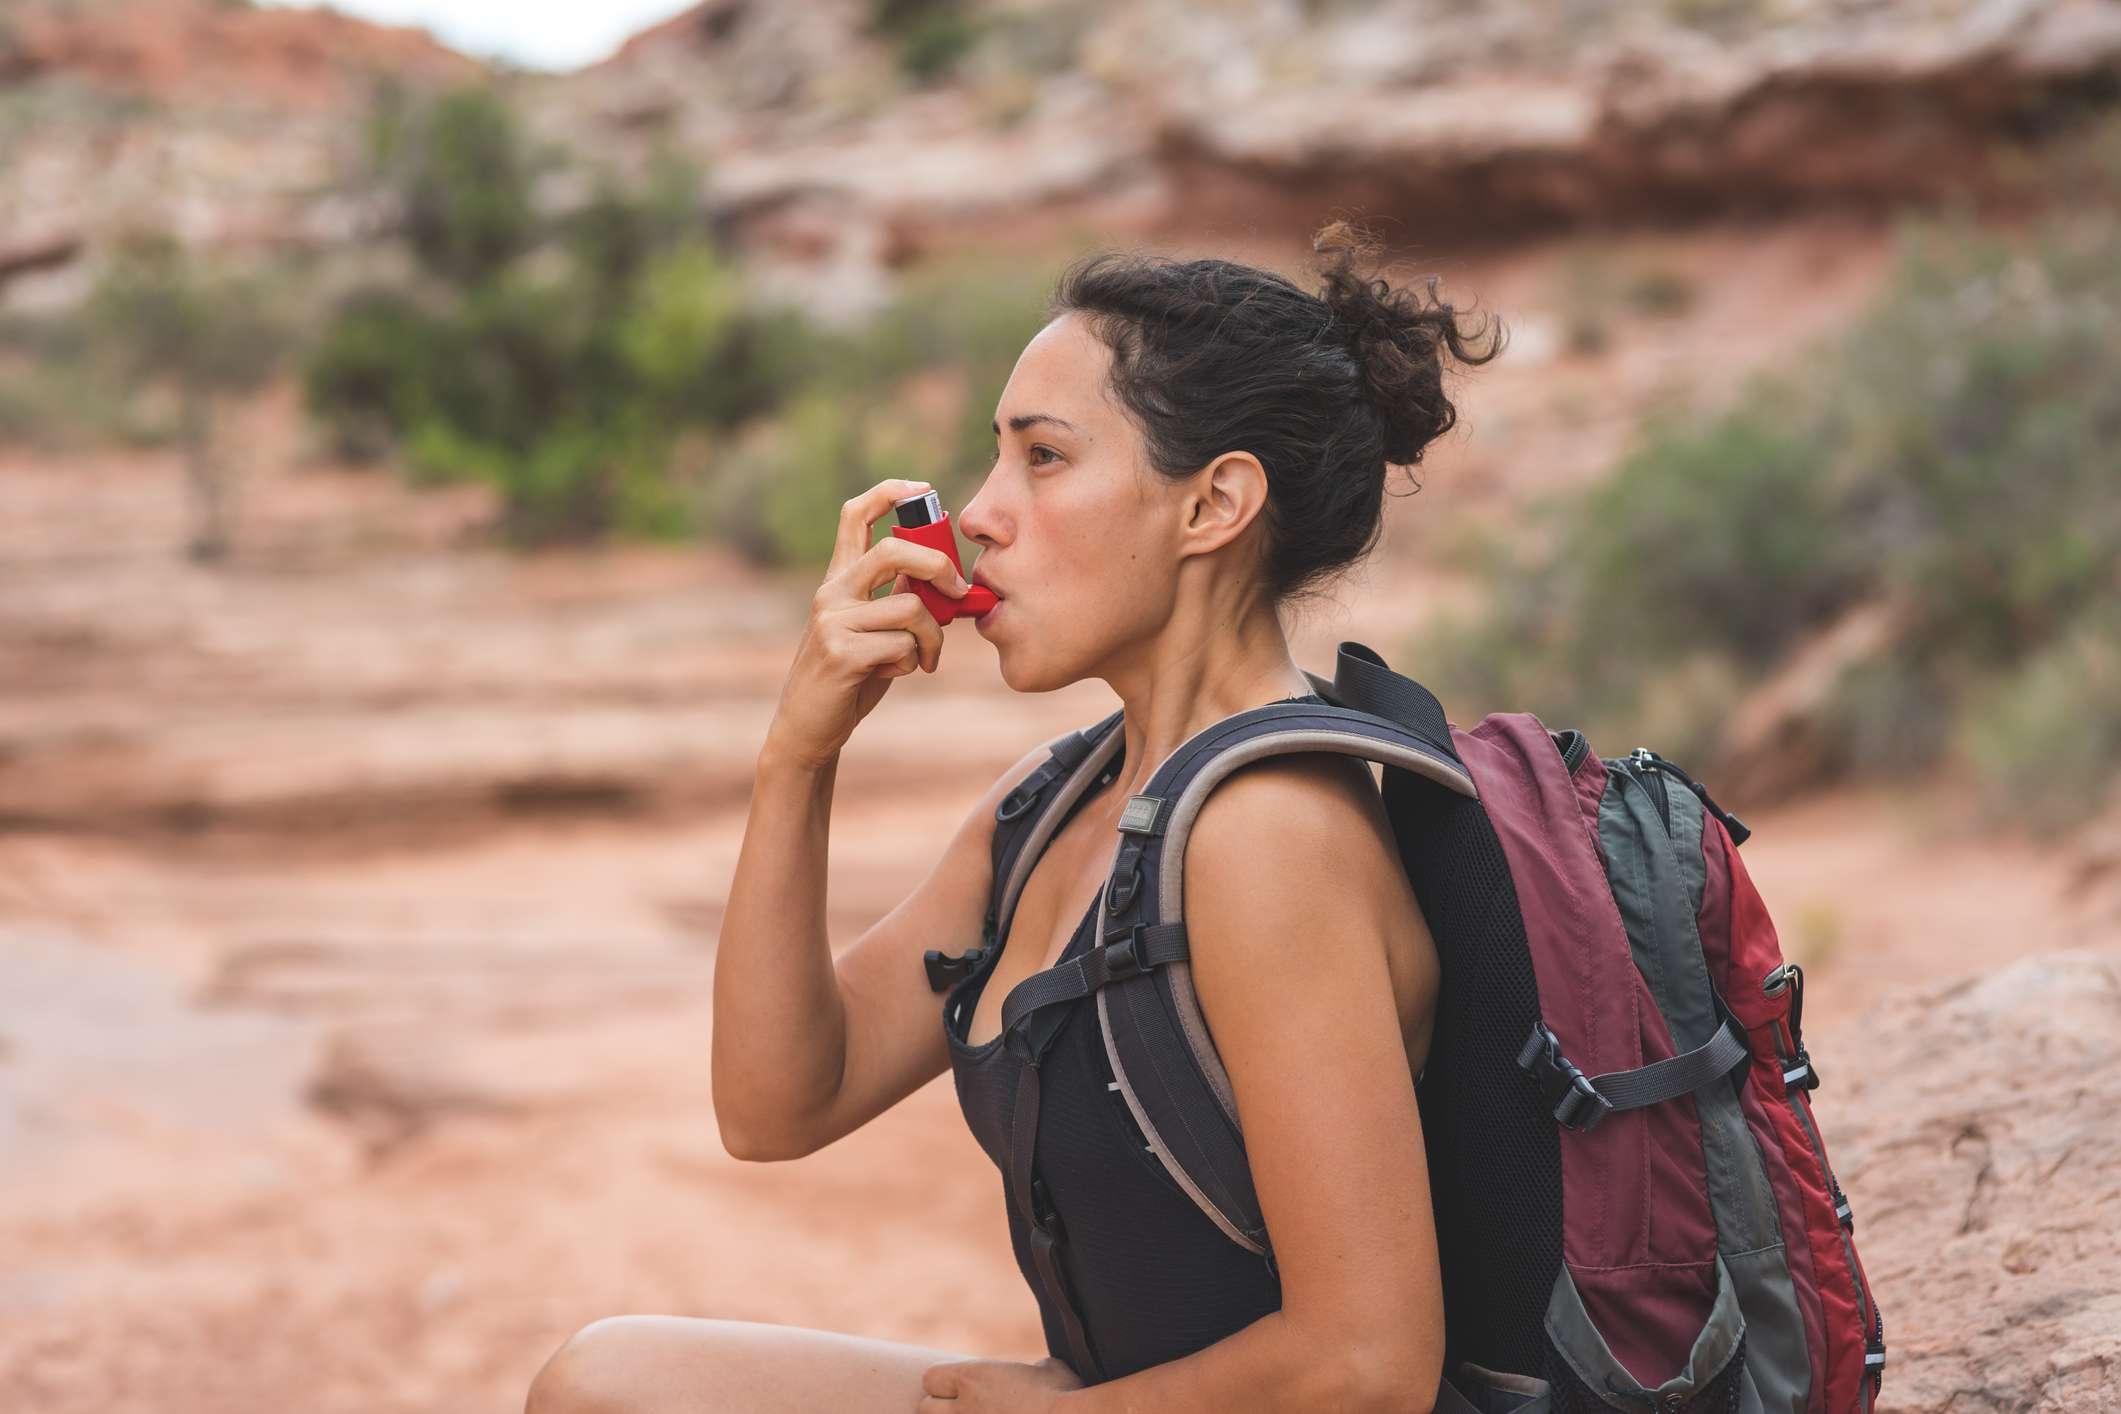 A hiker with asthma using her inhaler